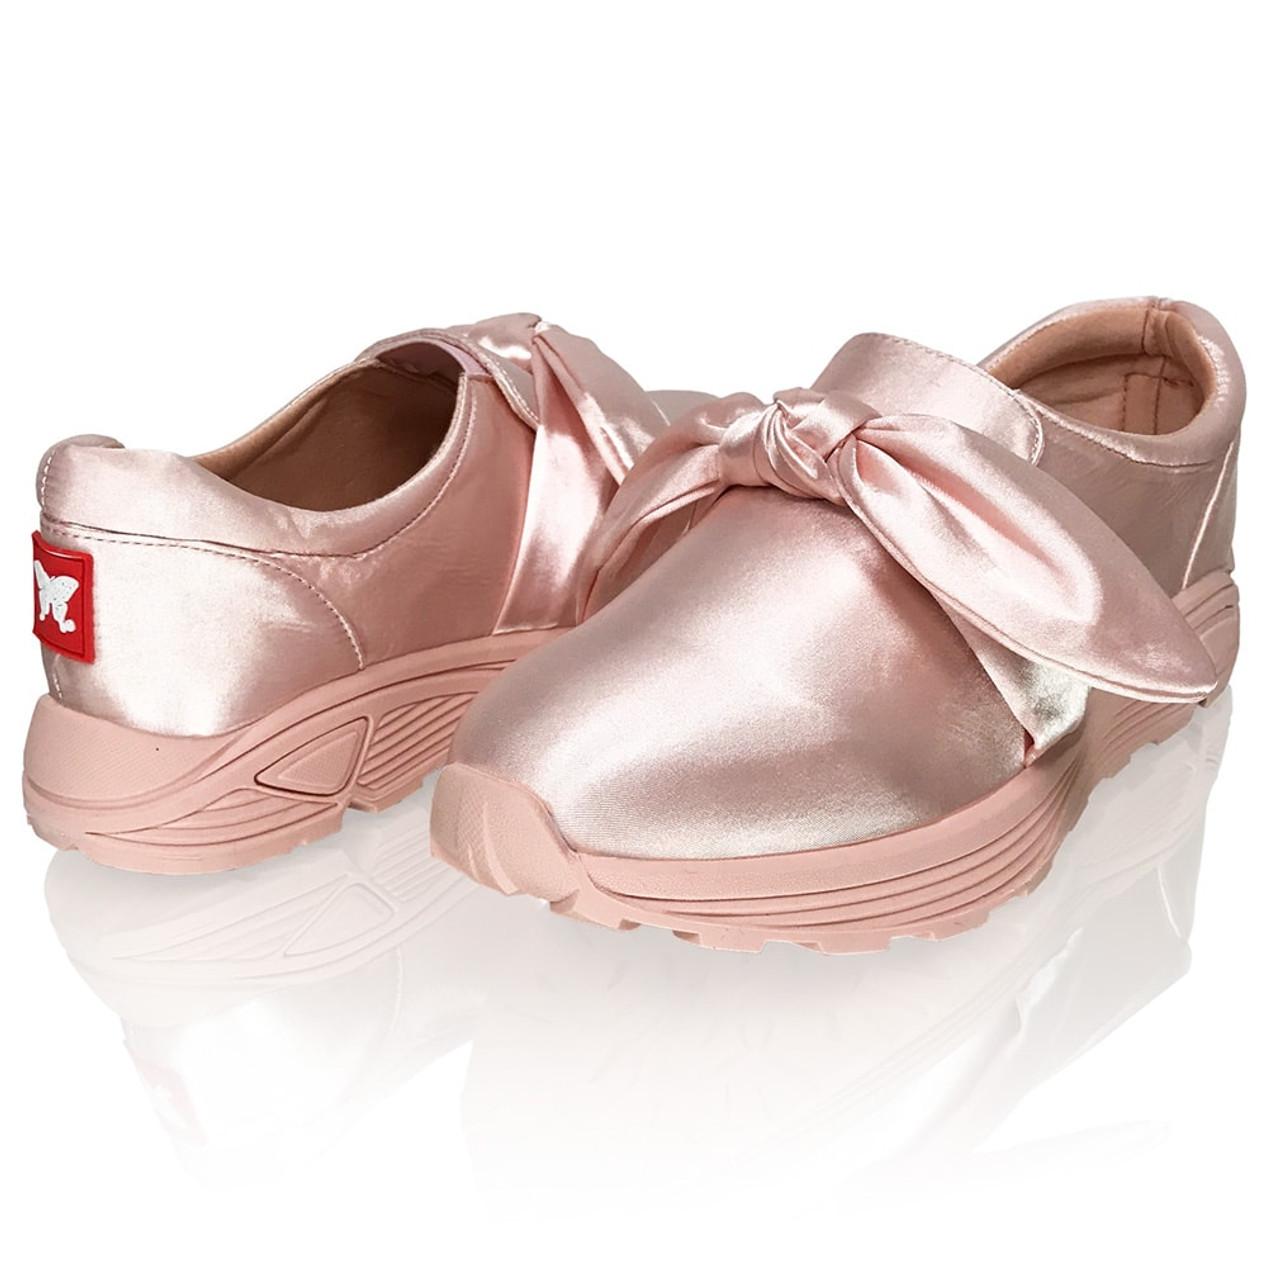 Pink Satin - Detachable Bows